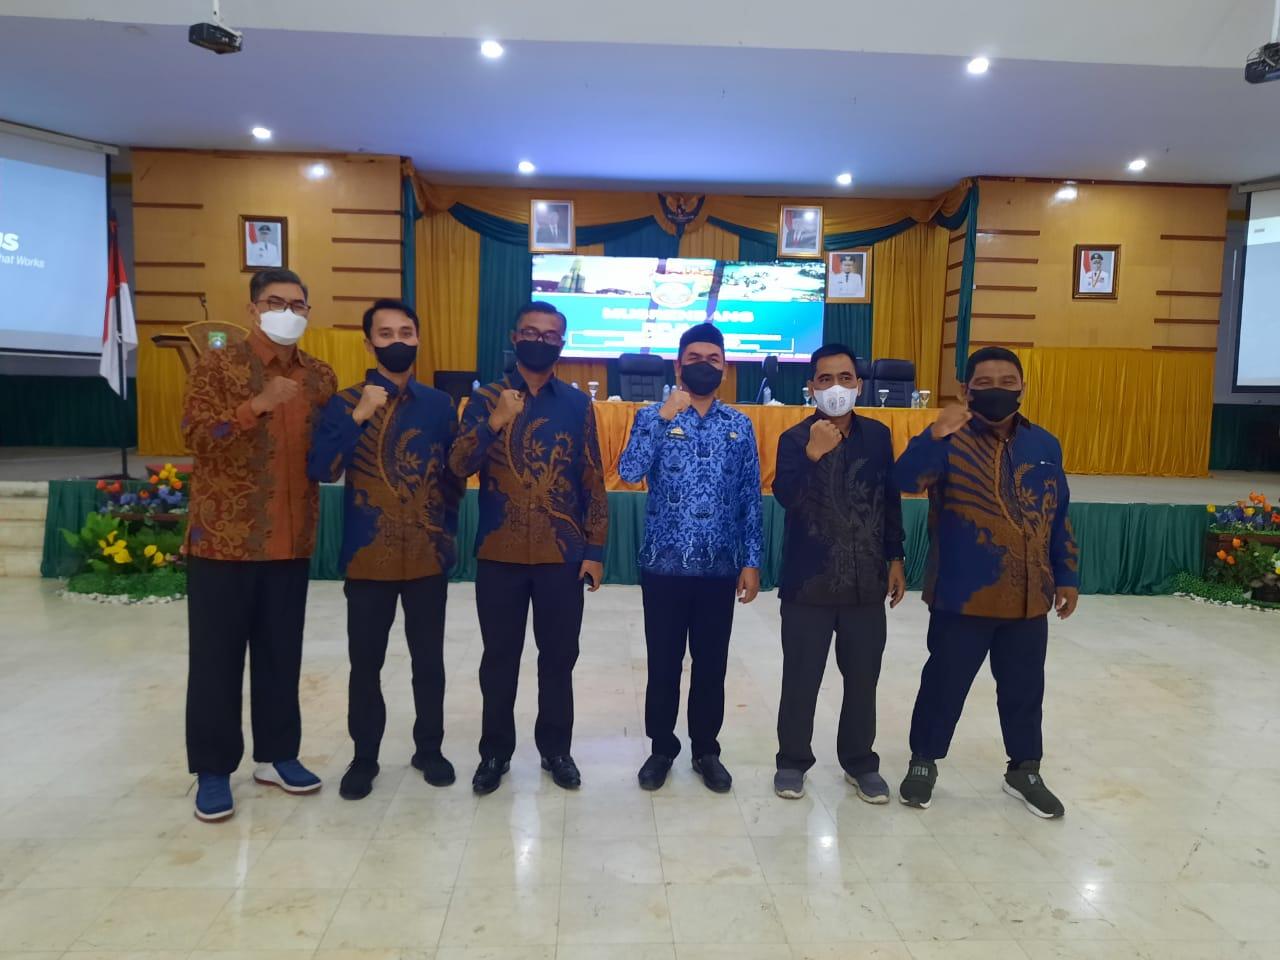 Wujudkan Pangkep Hebat, Tim Unifa Hadiri Undangan Musrembang RPJMD Kabupaten Pangkep